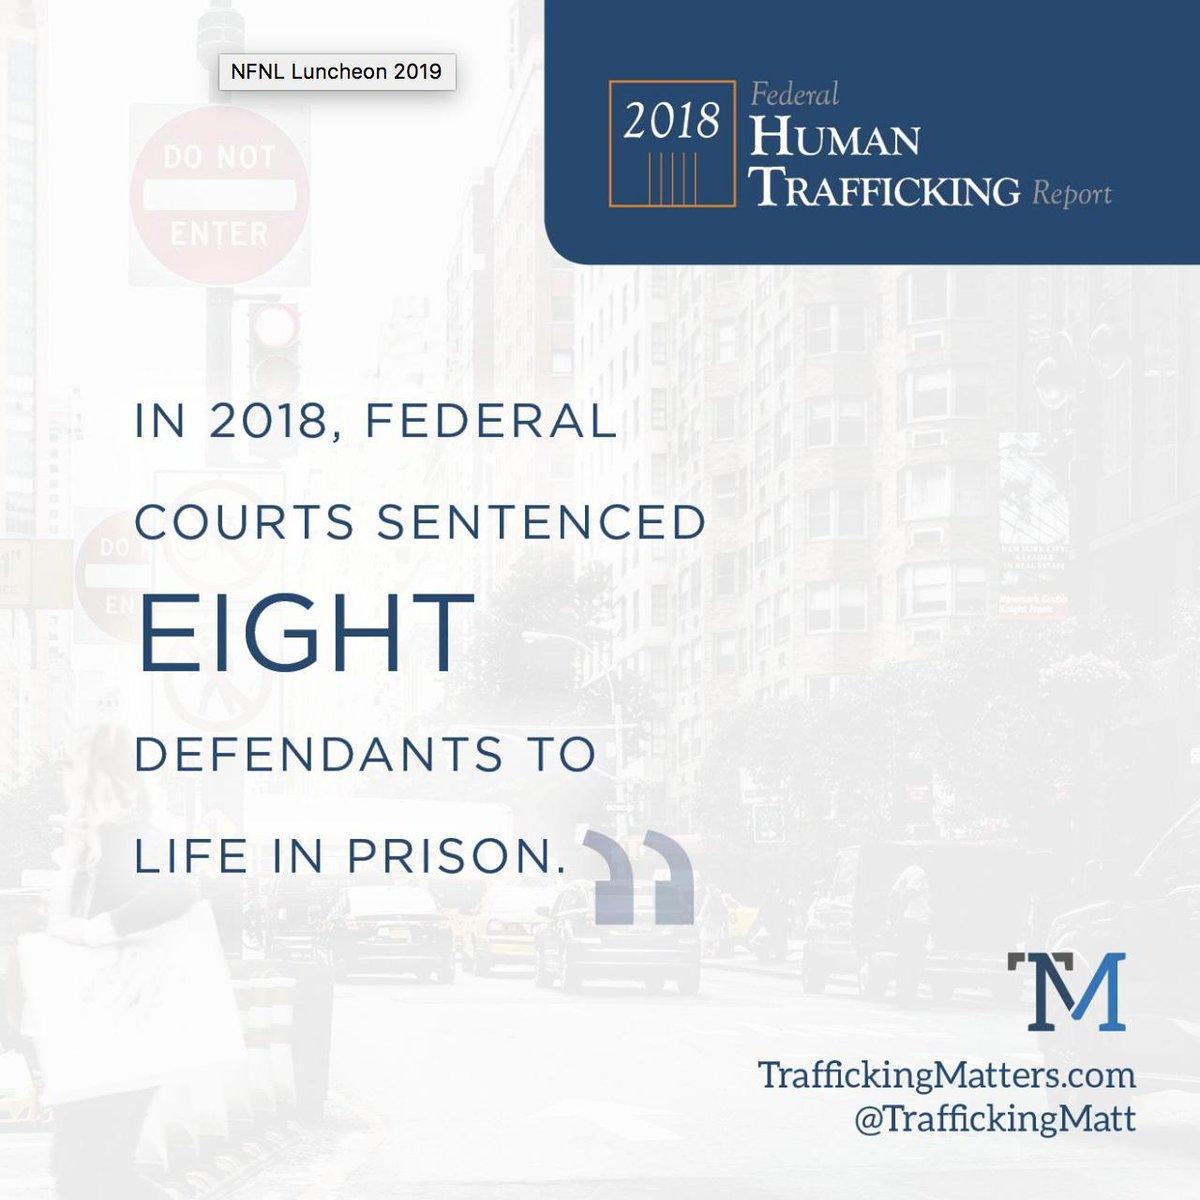 traffickingmatters hashtag on Twitter